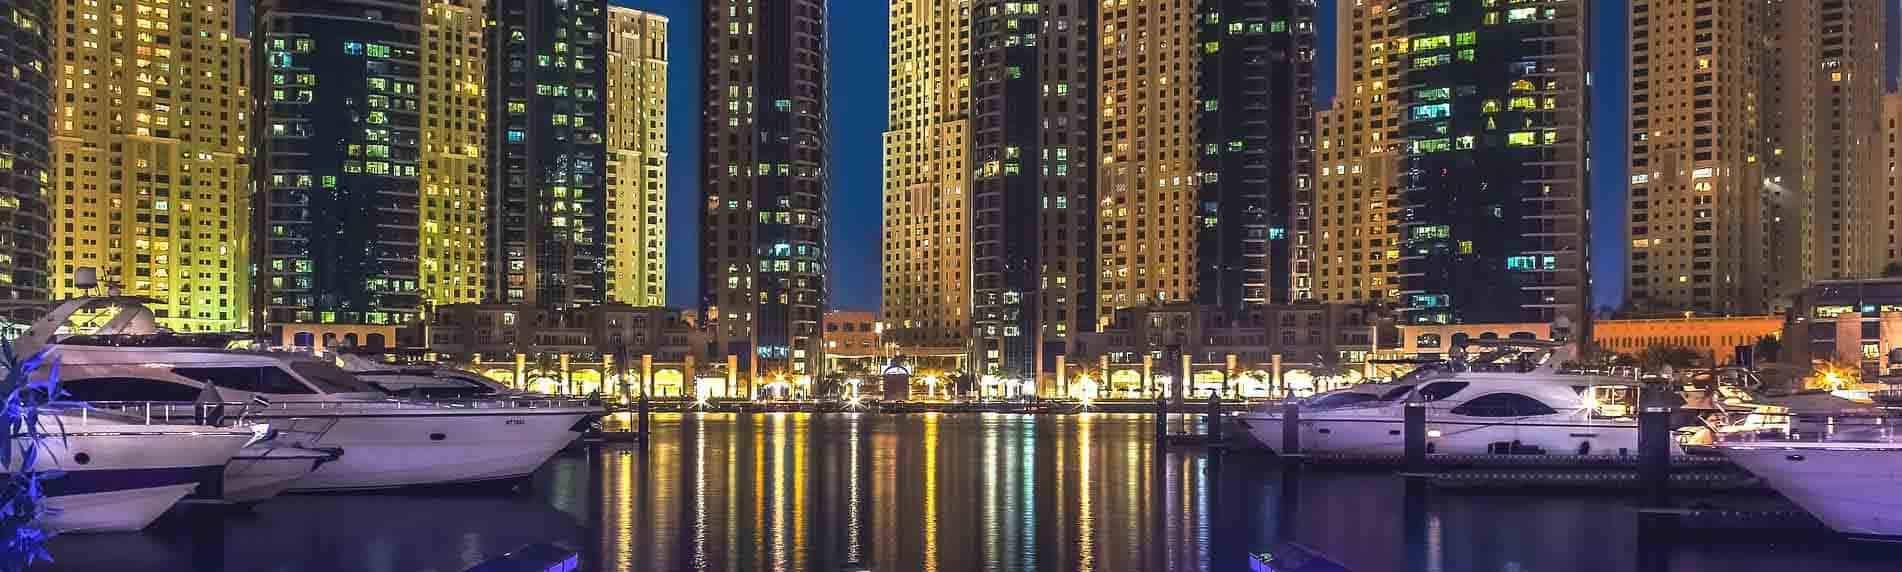 2 Nights Dubai Package